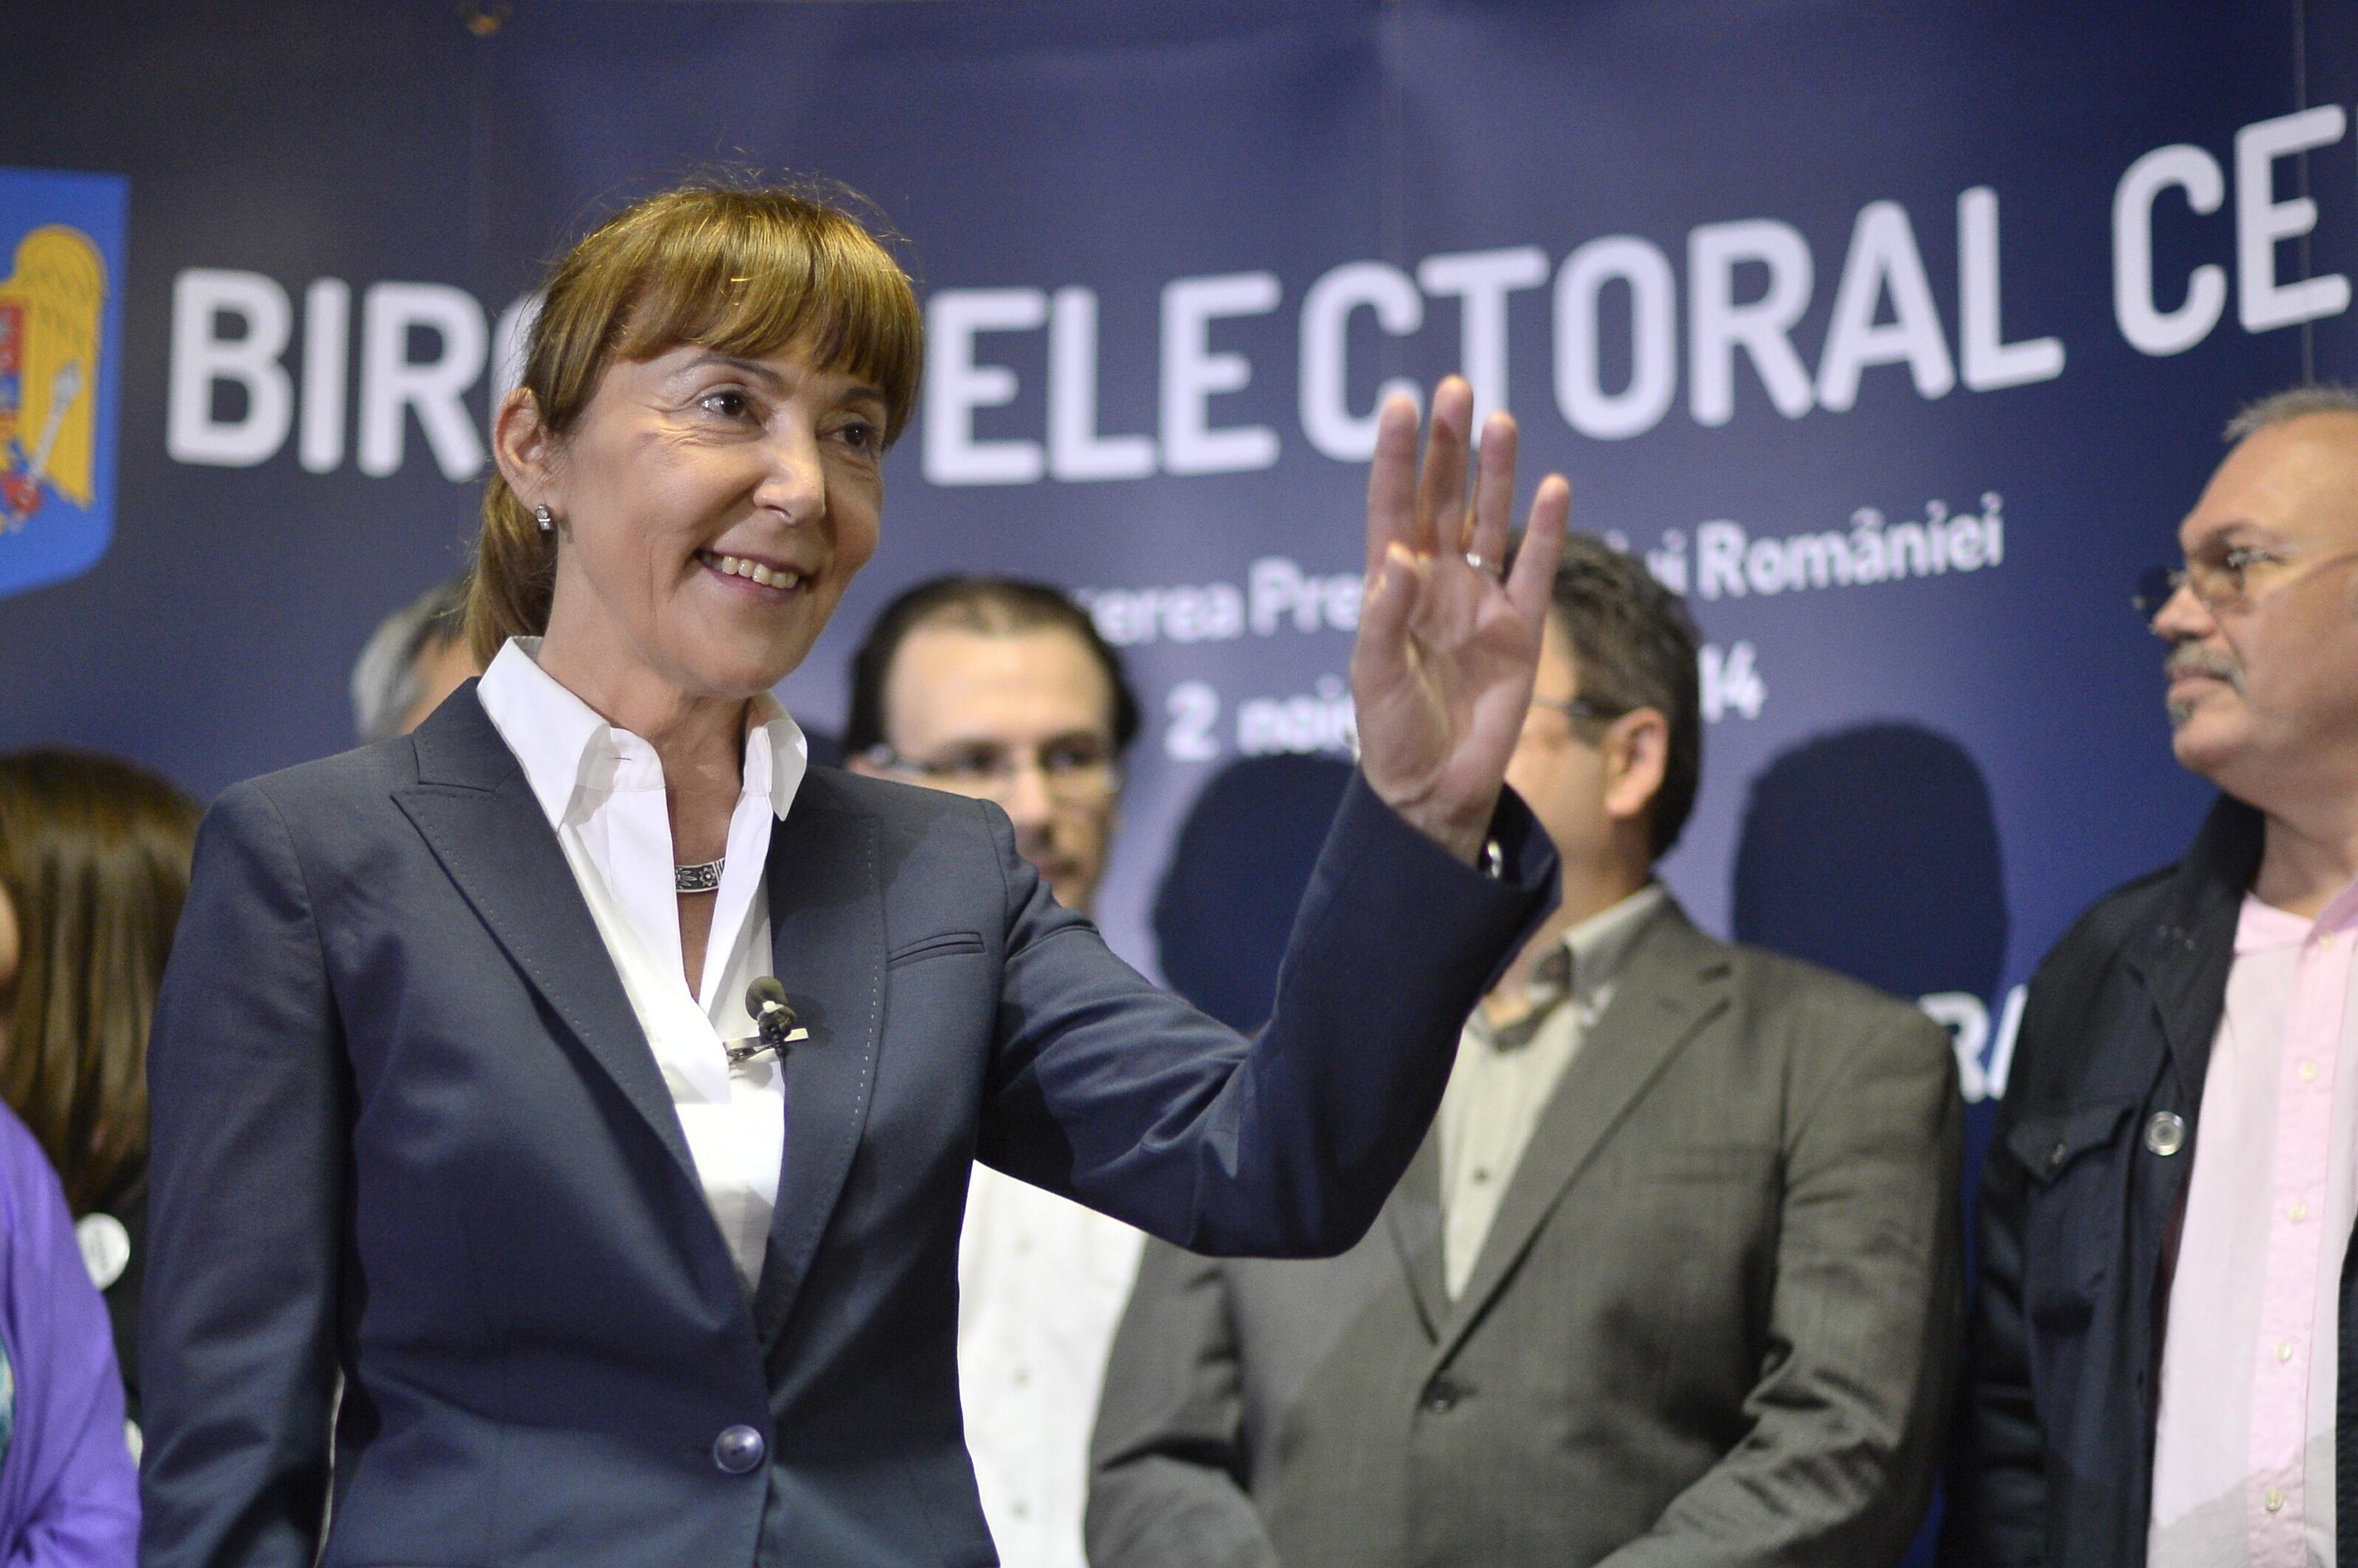 Monica Macovei si-a depus candidatura la prezidentiale: Le-am adus popcorn lui Ponta si o oglinda lui Iohannis